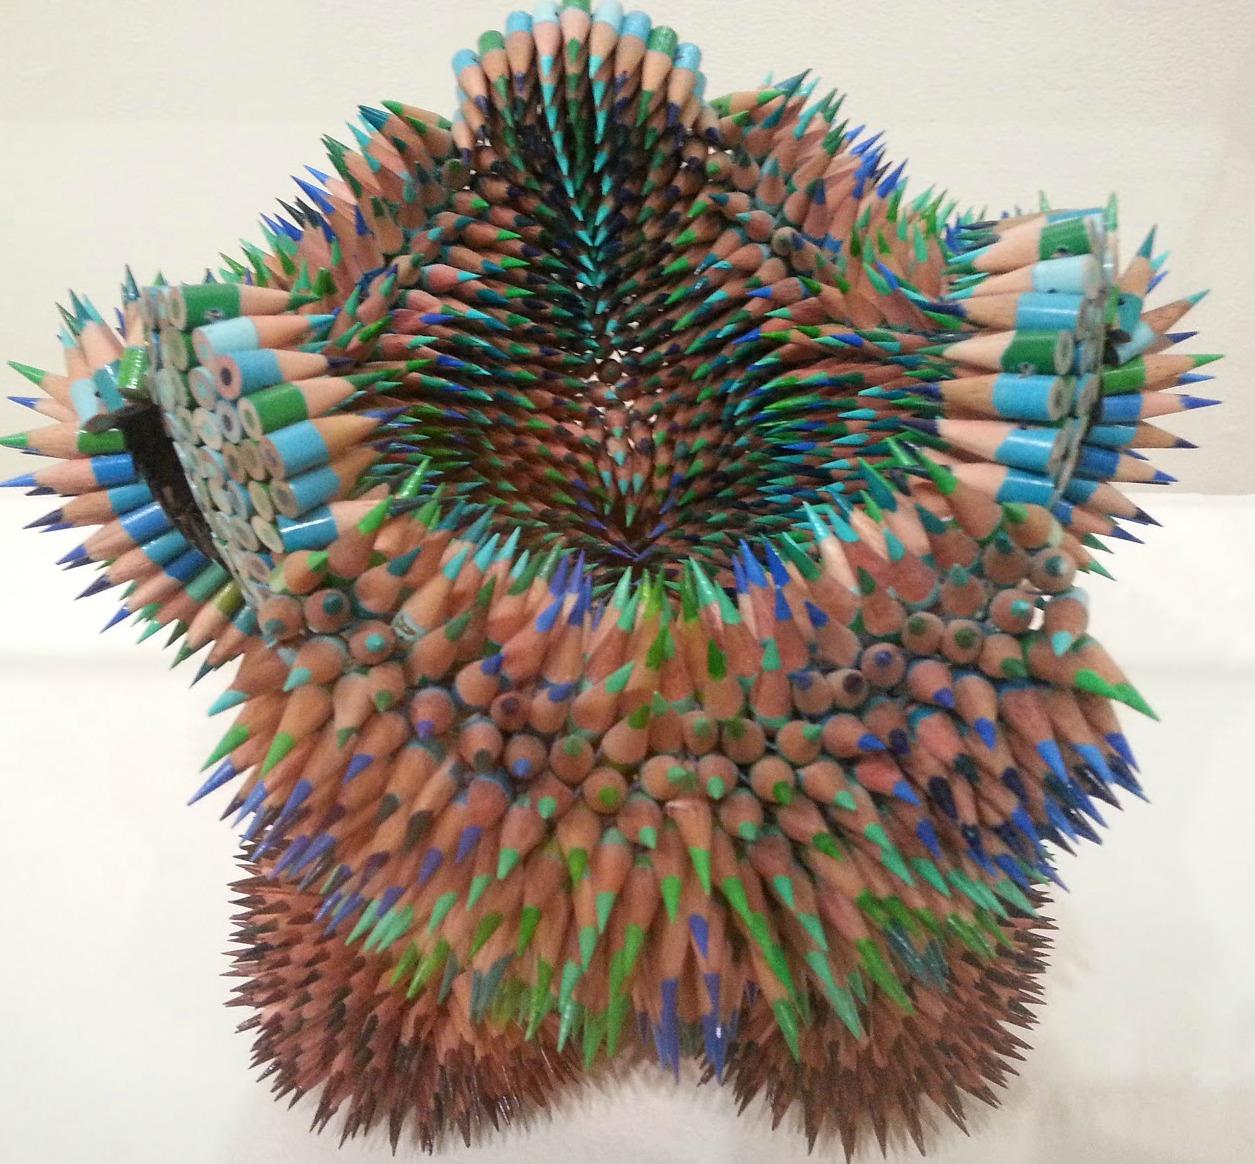 kalem heykeller